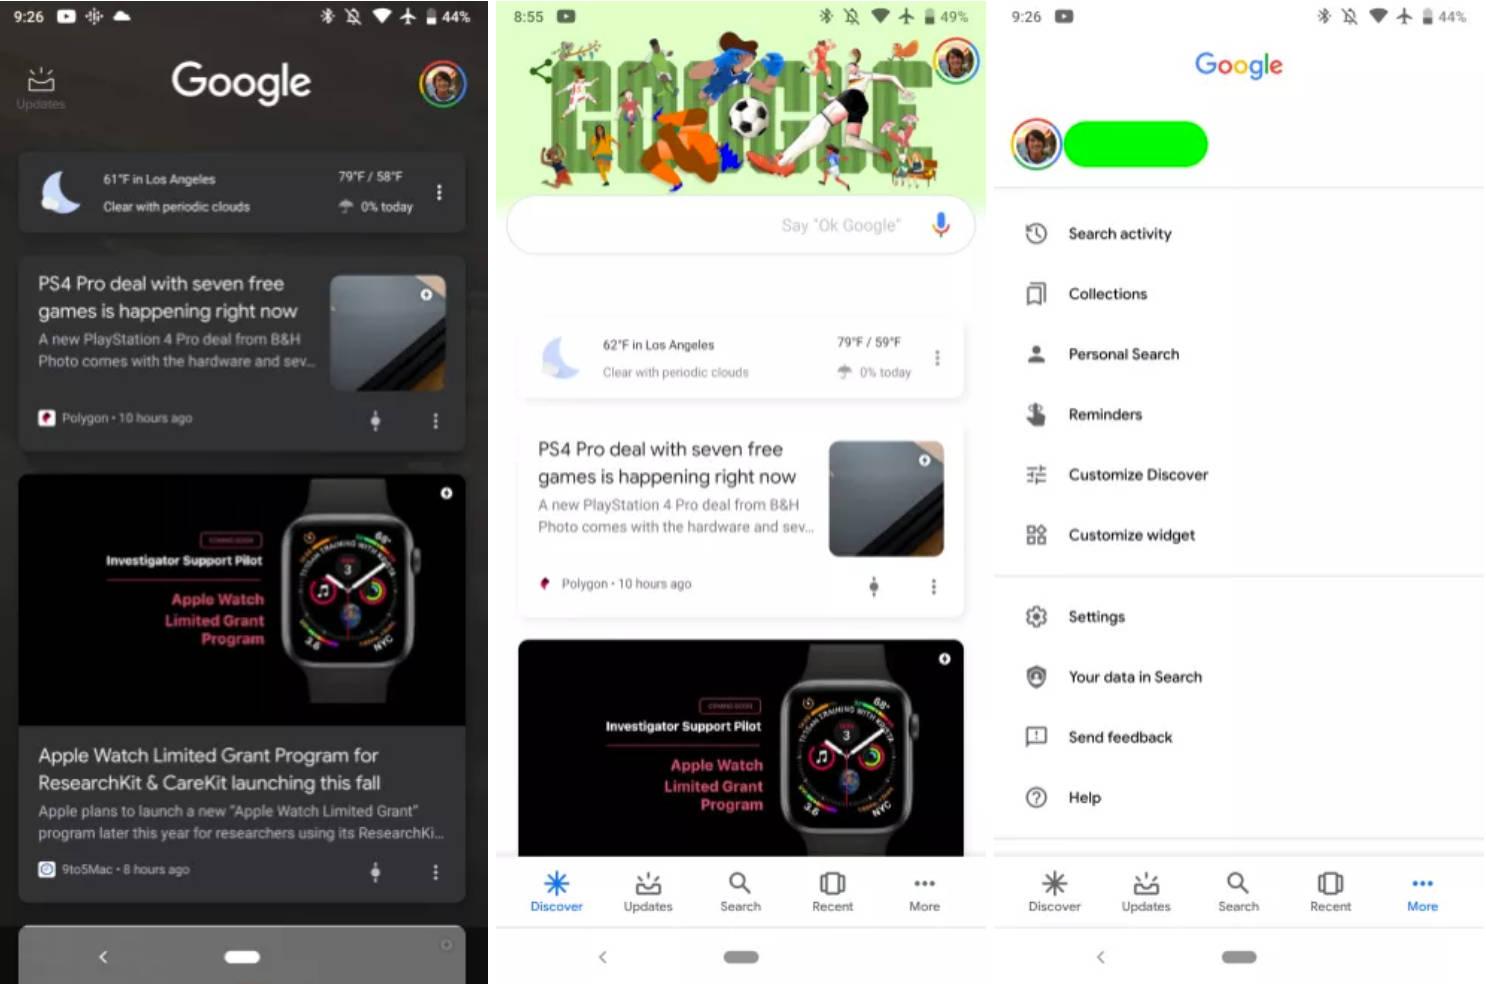 Asystent Google One wskaźnik Google 10.4 beta aplikacje zablokowany ekran Android